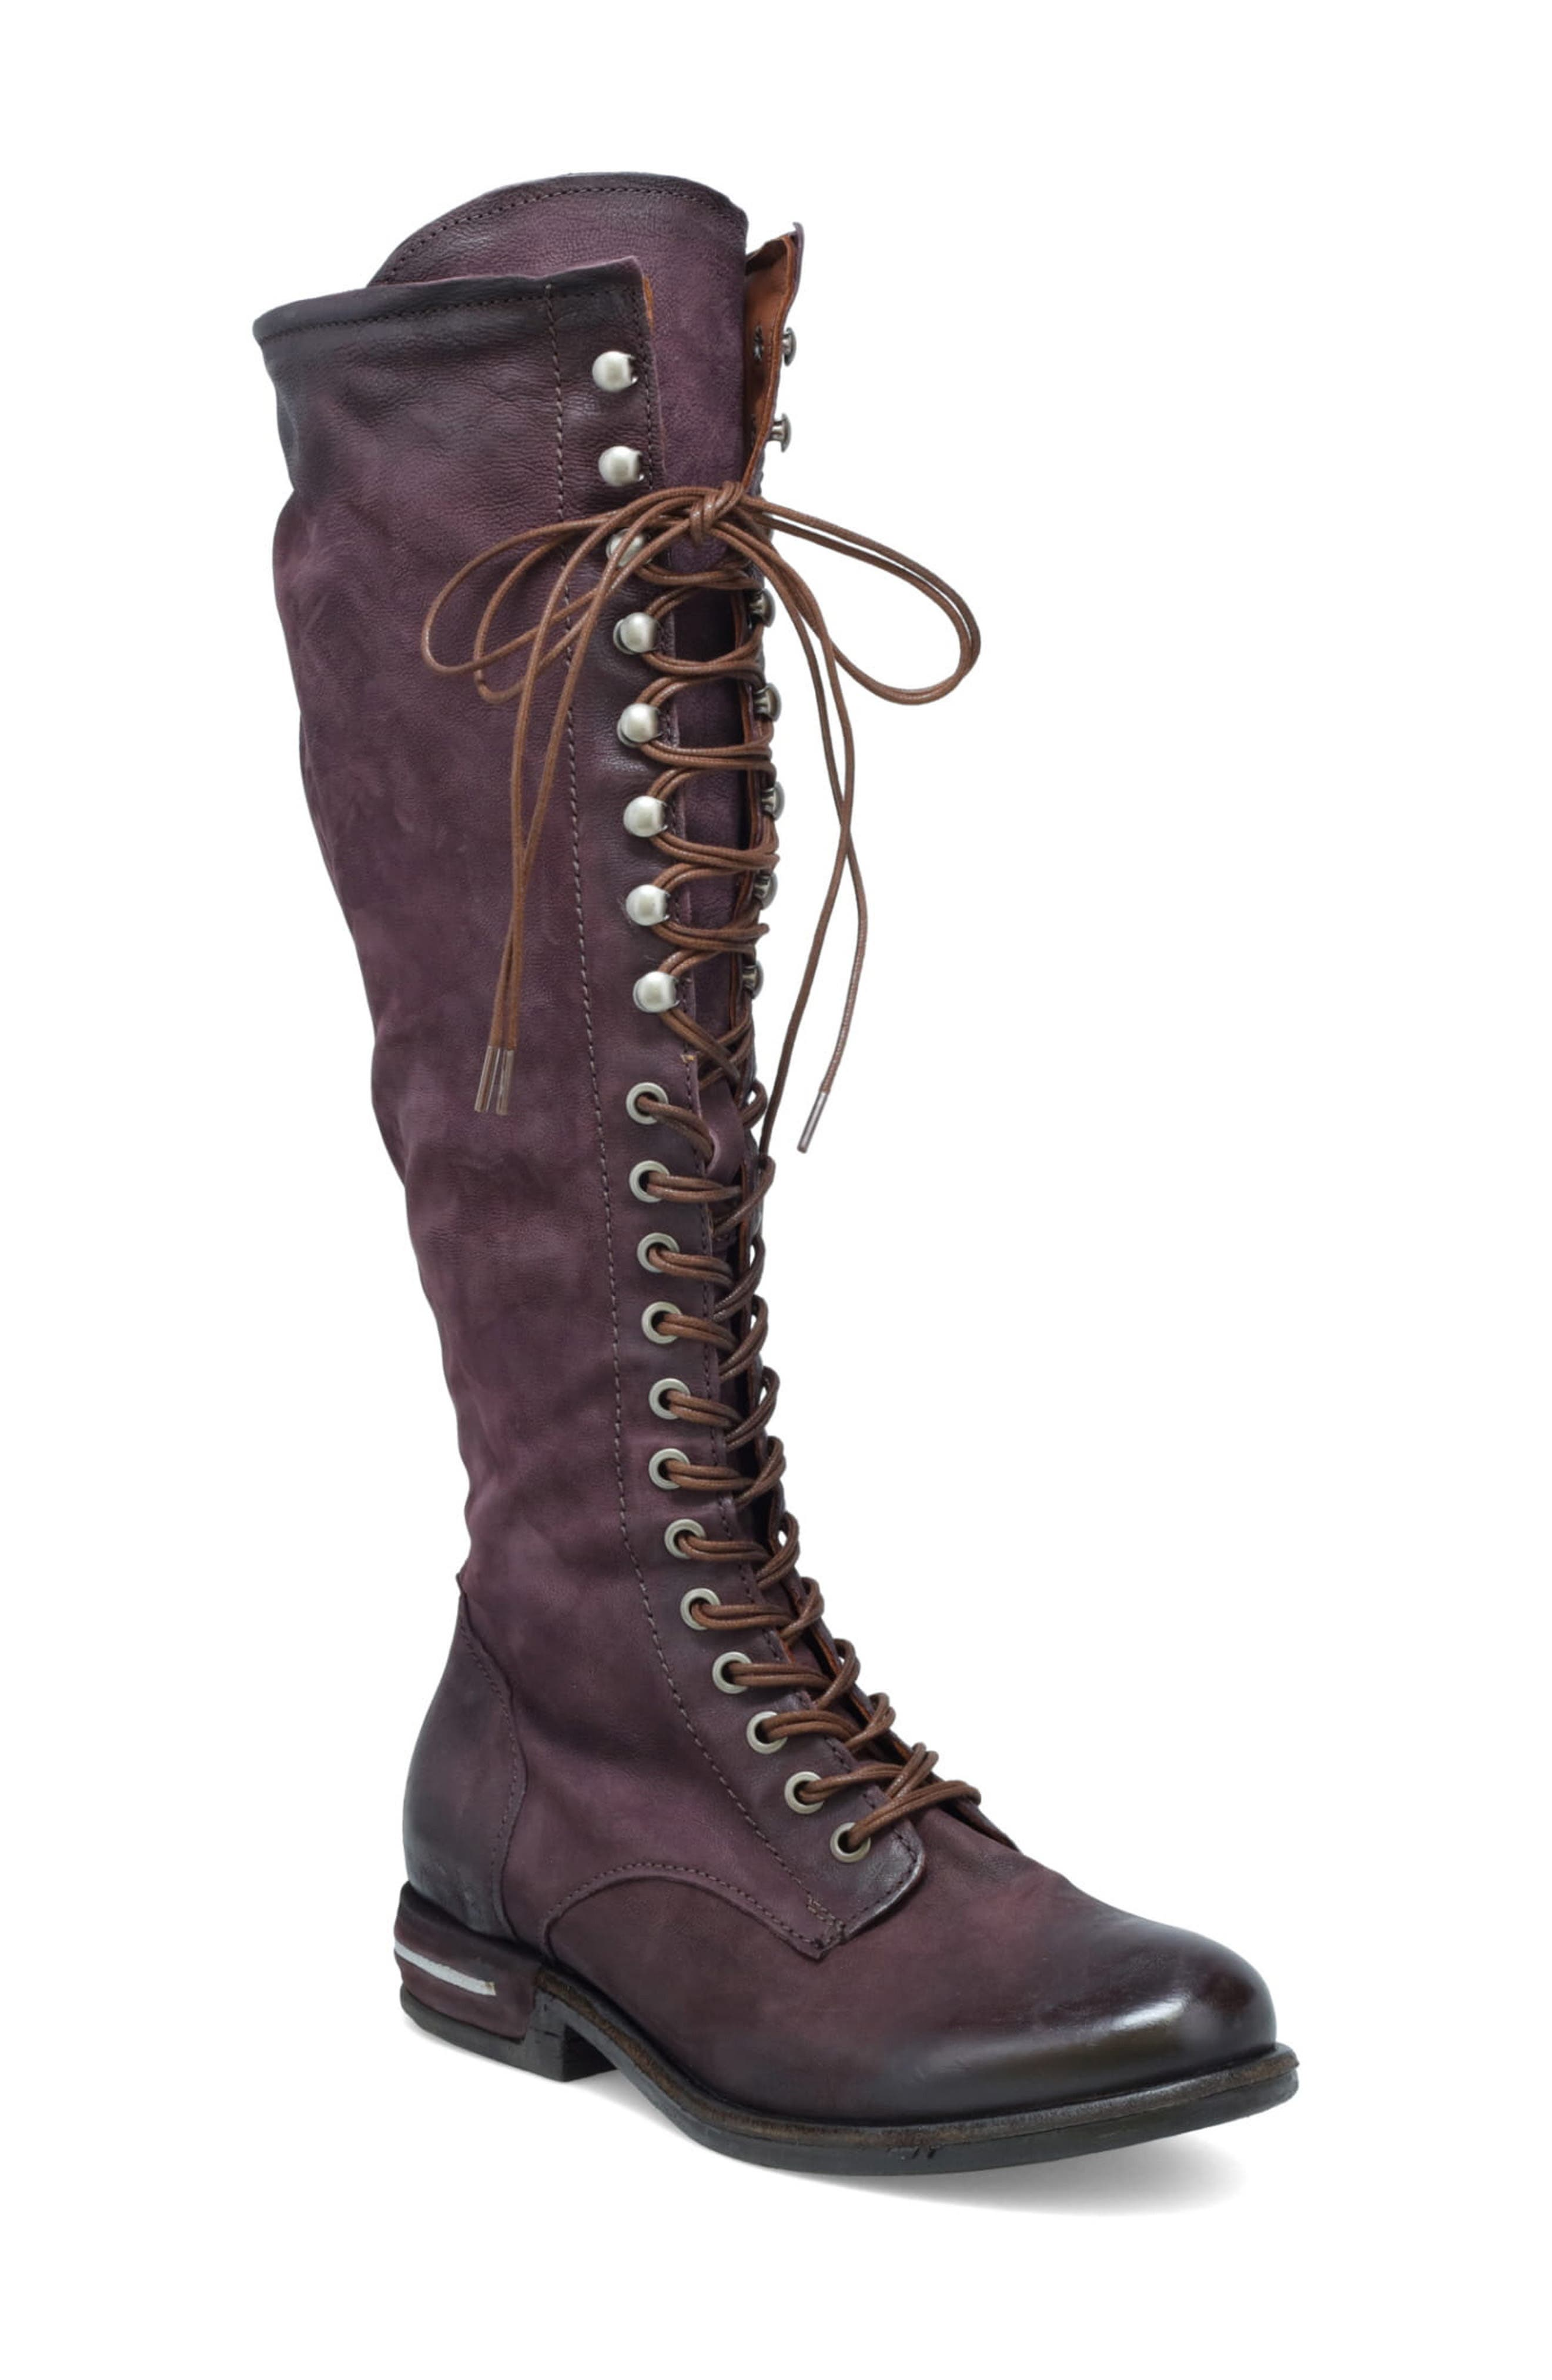 Women's A.s.98 Trillie Knee High Boot